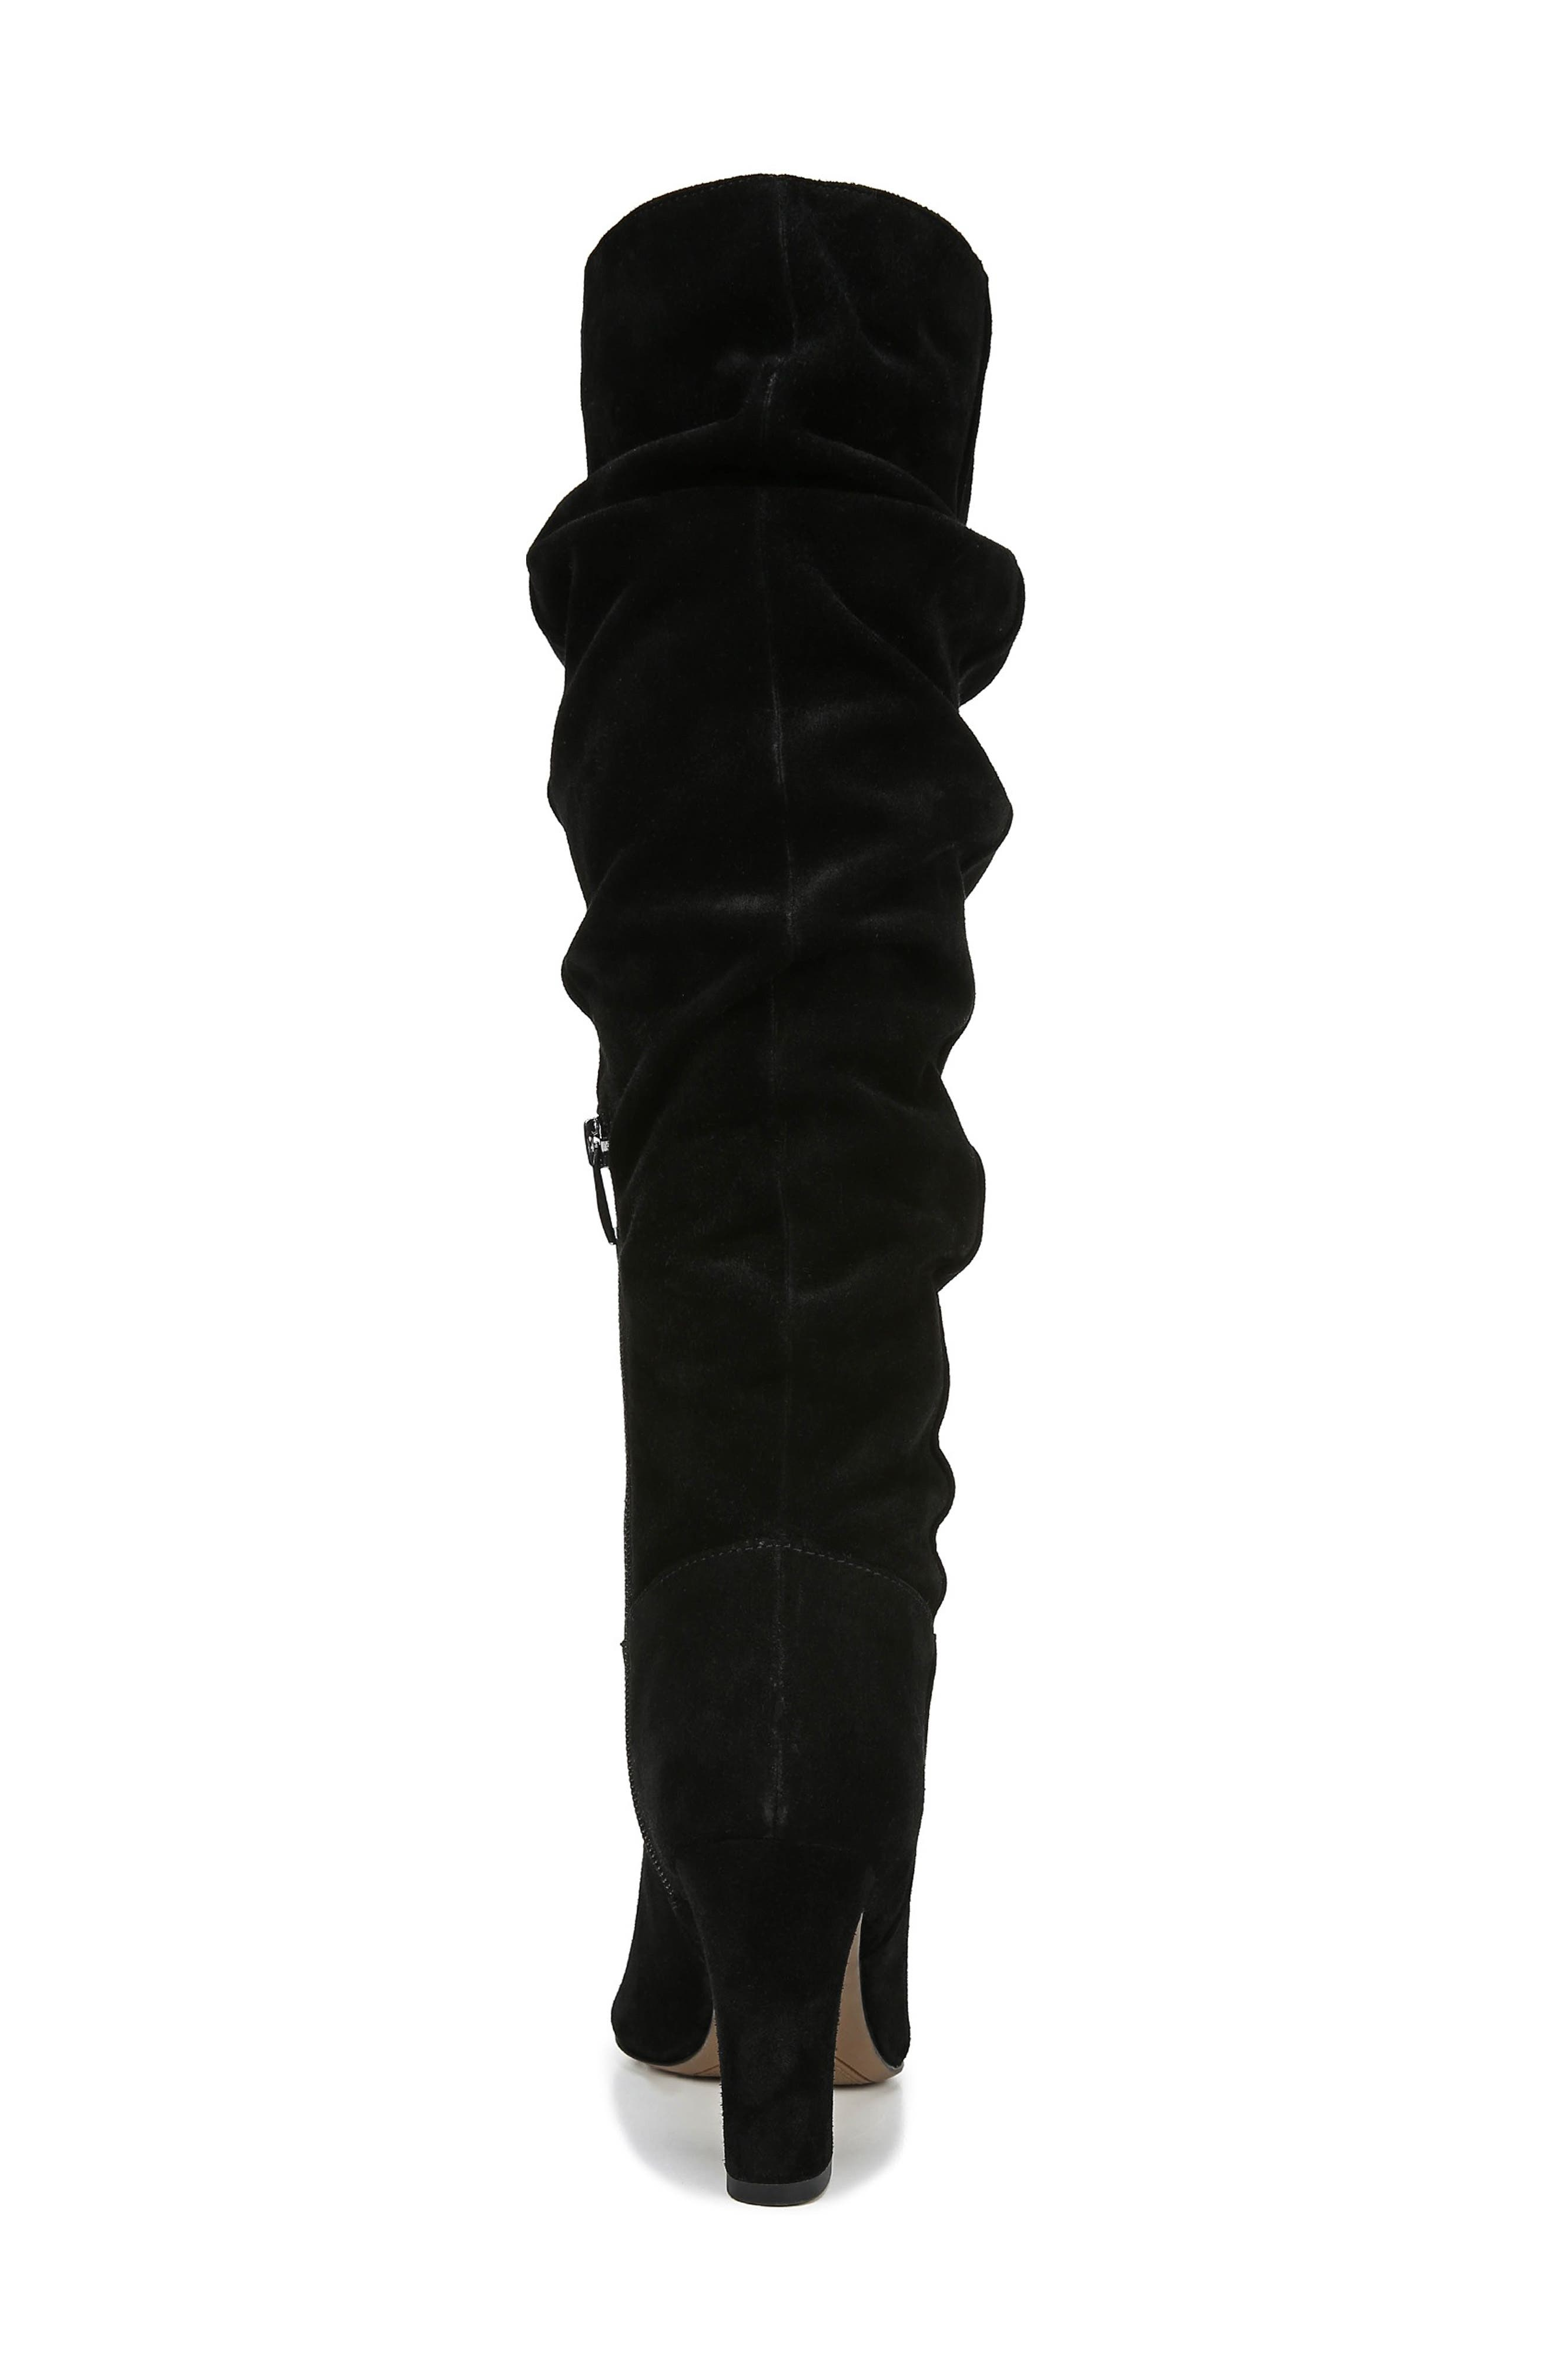 Artesia Knee High Boot,                             Alternate thumbnail 7, color,                             BLACK SUEDE